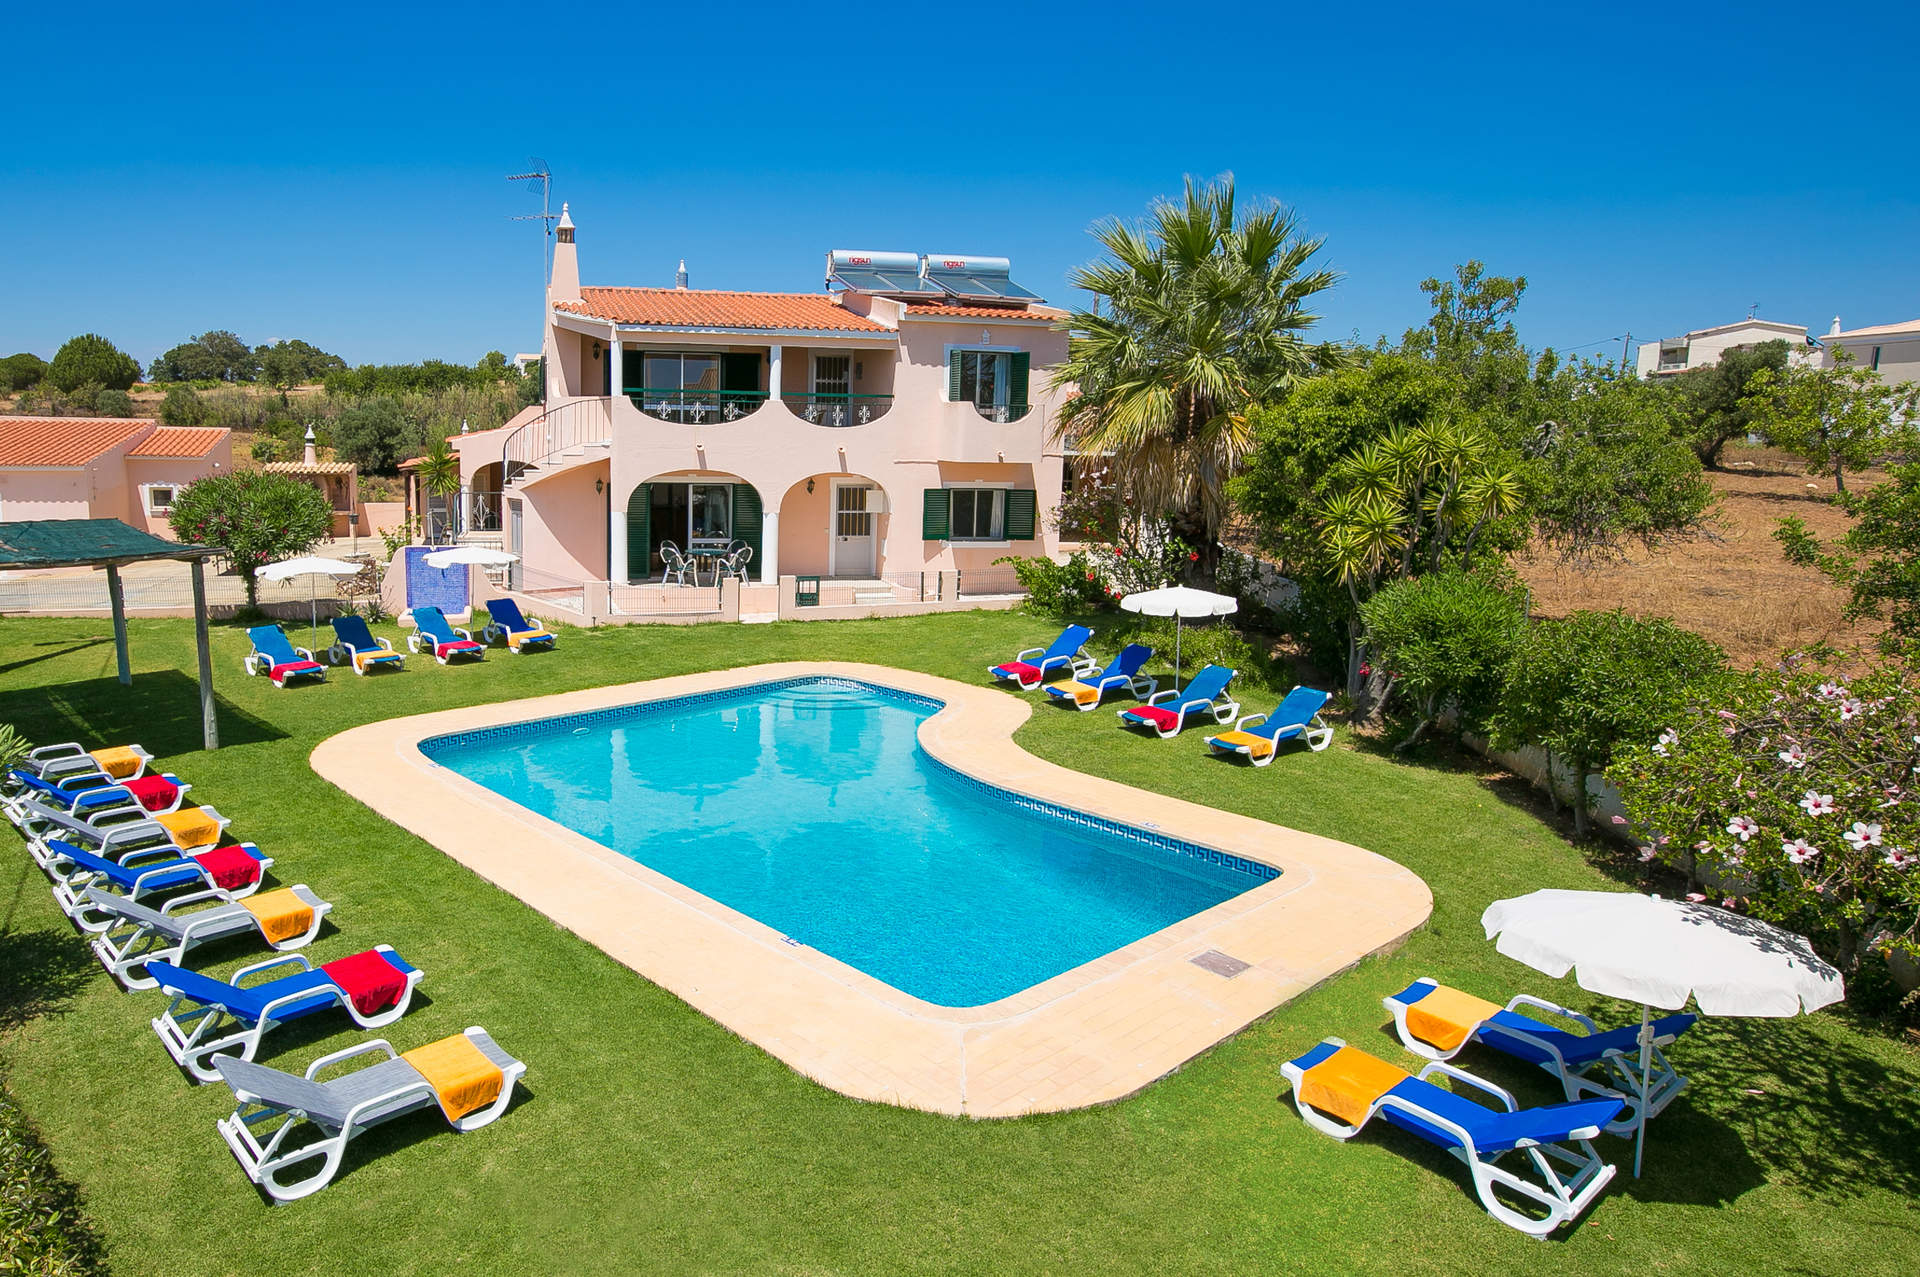 Villa Amizade, Branqueira, Algarve, Portugal